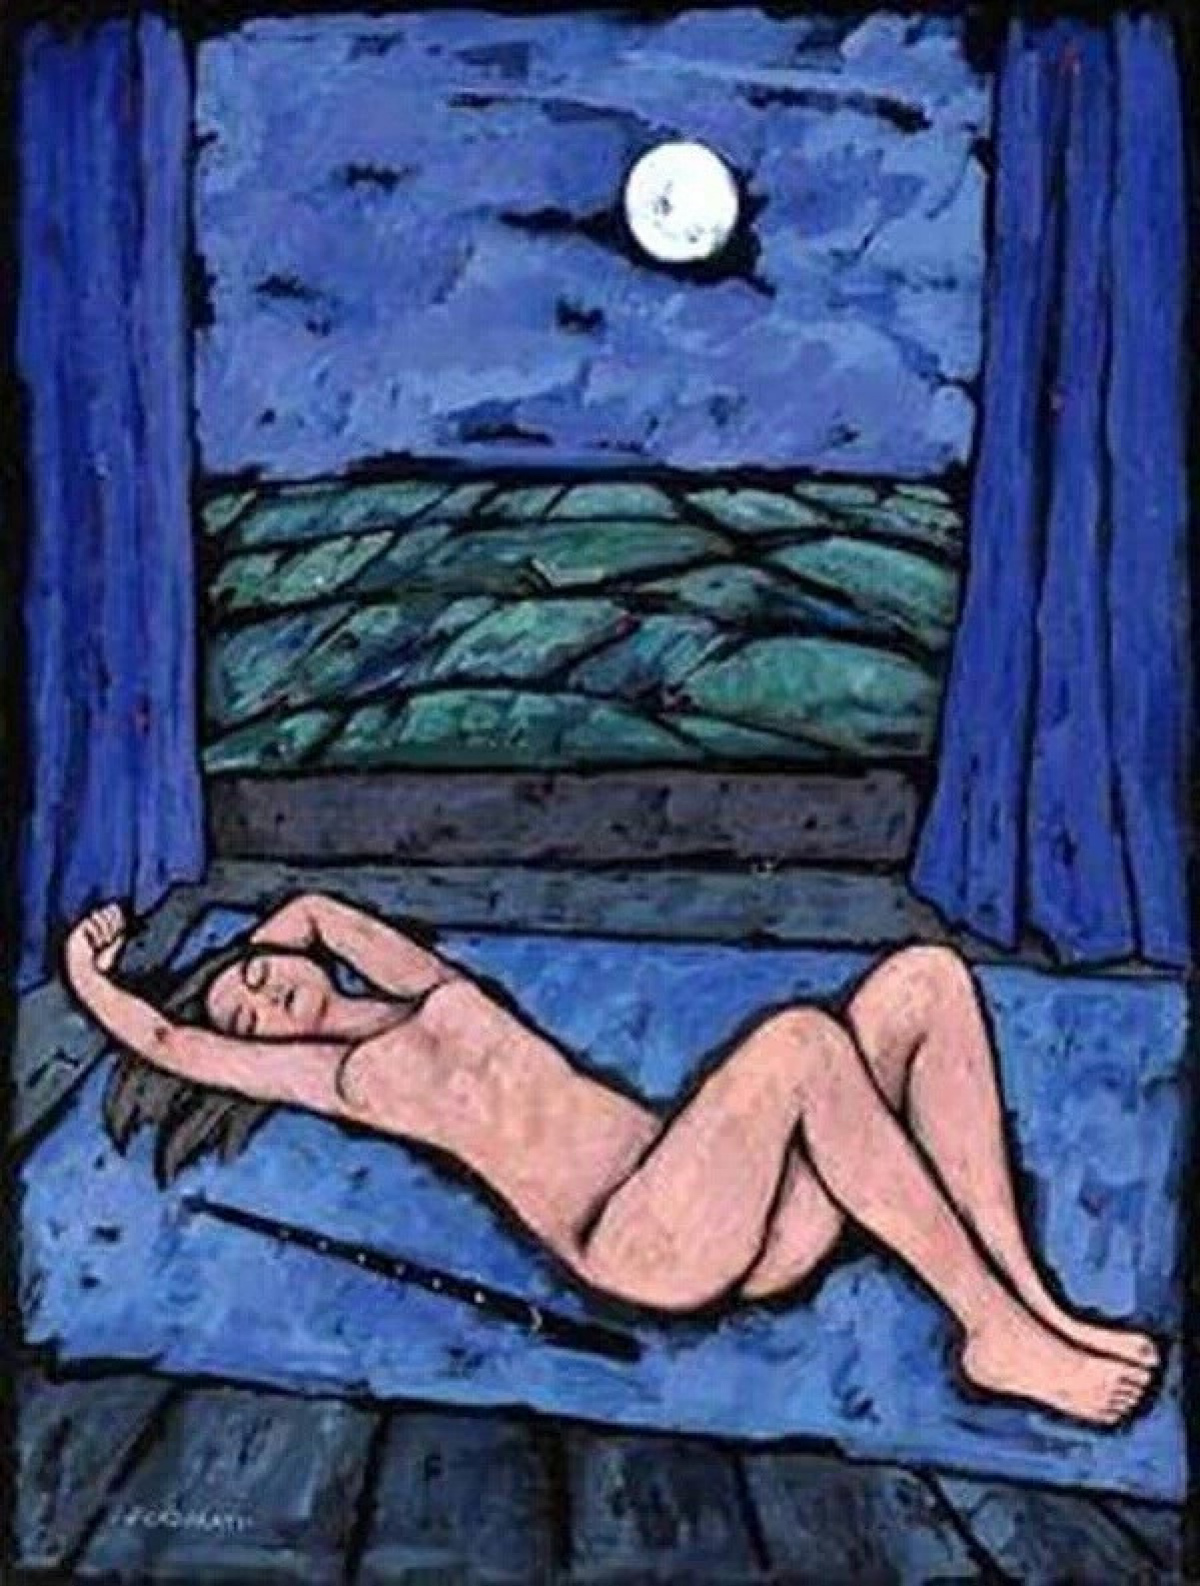 Феличе Казорати. Обнаженная спит